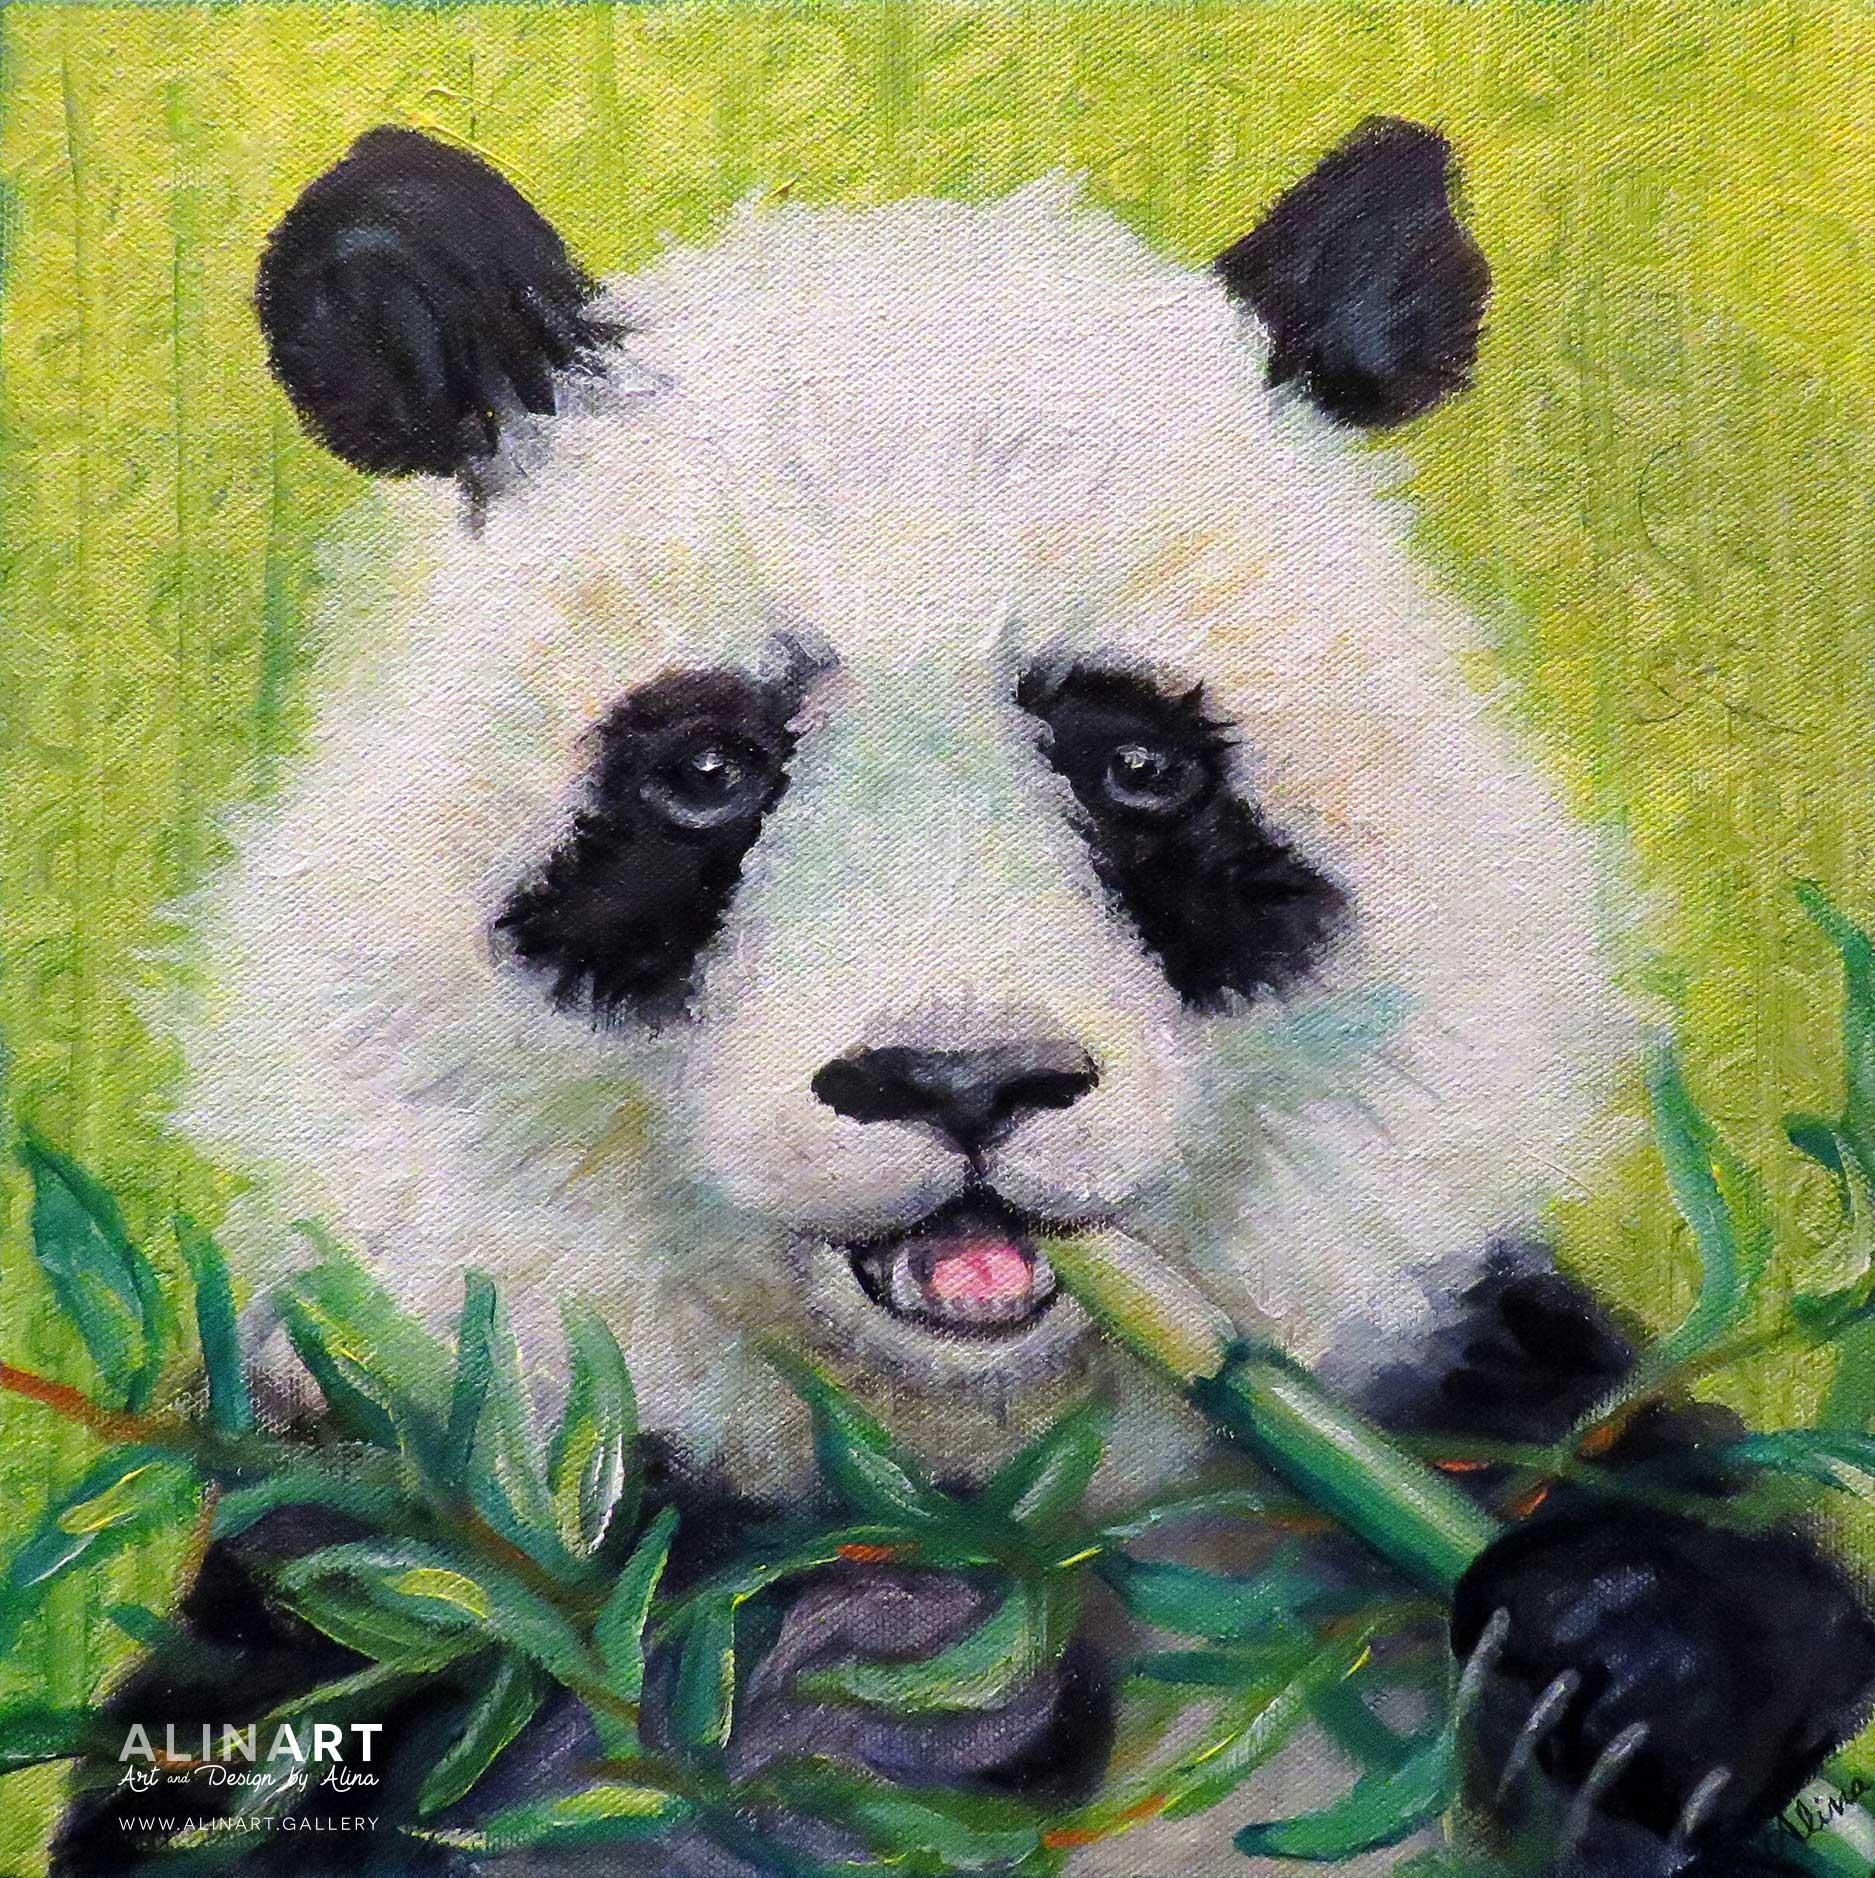 Bamboo Buffet , 2015, Acrylic on canvas